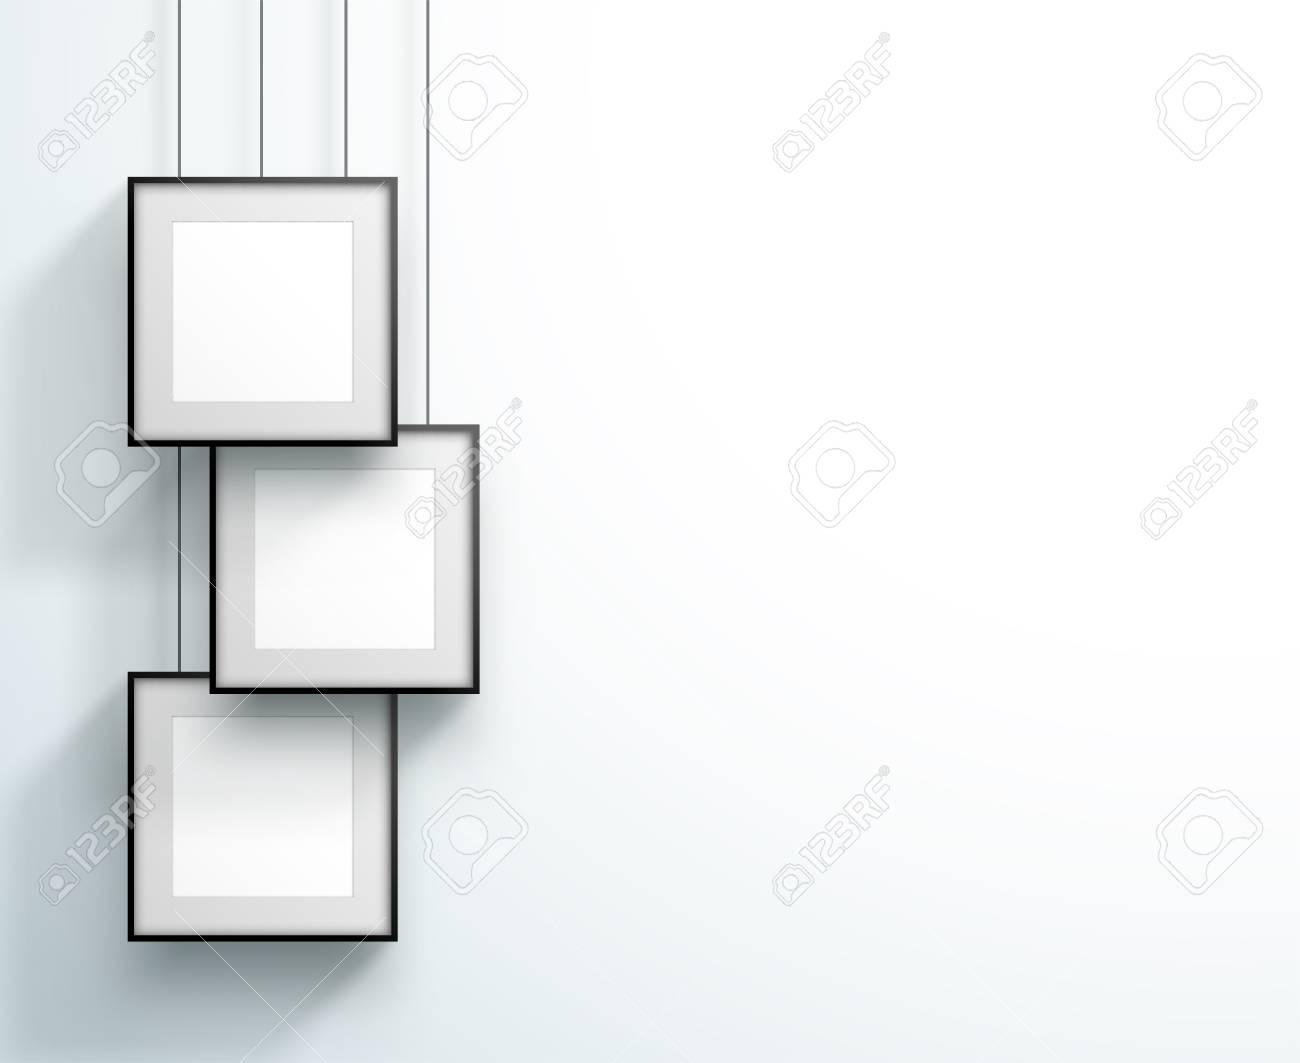 Photo Frame 3 Set Hanging Overlapping Square Design - 122008440